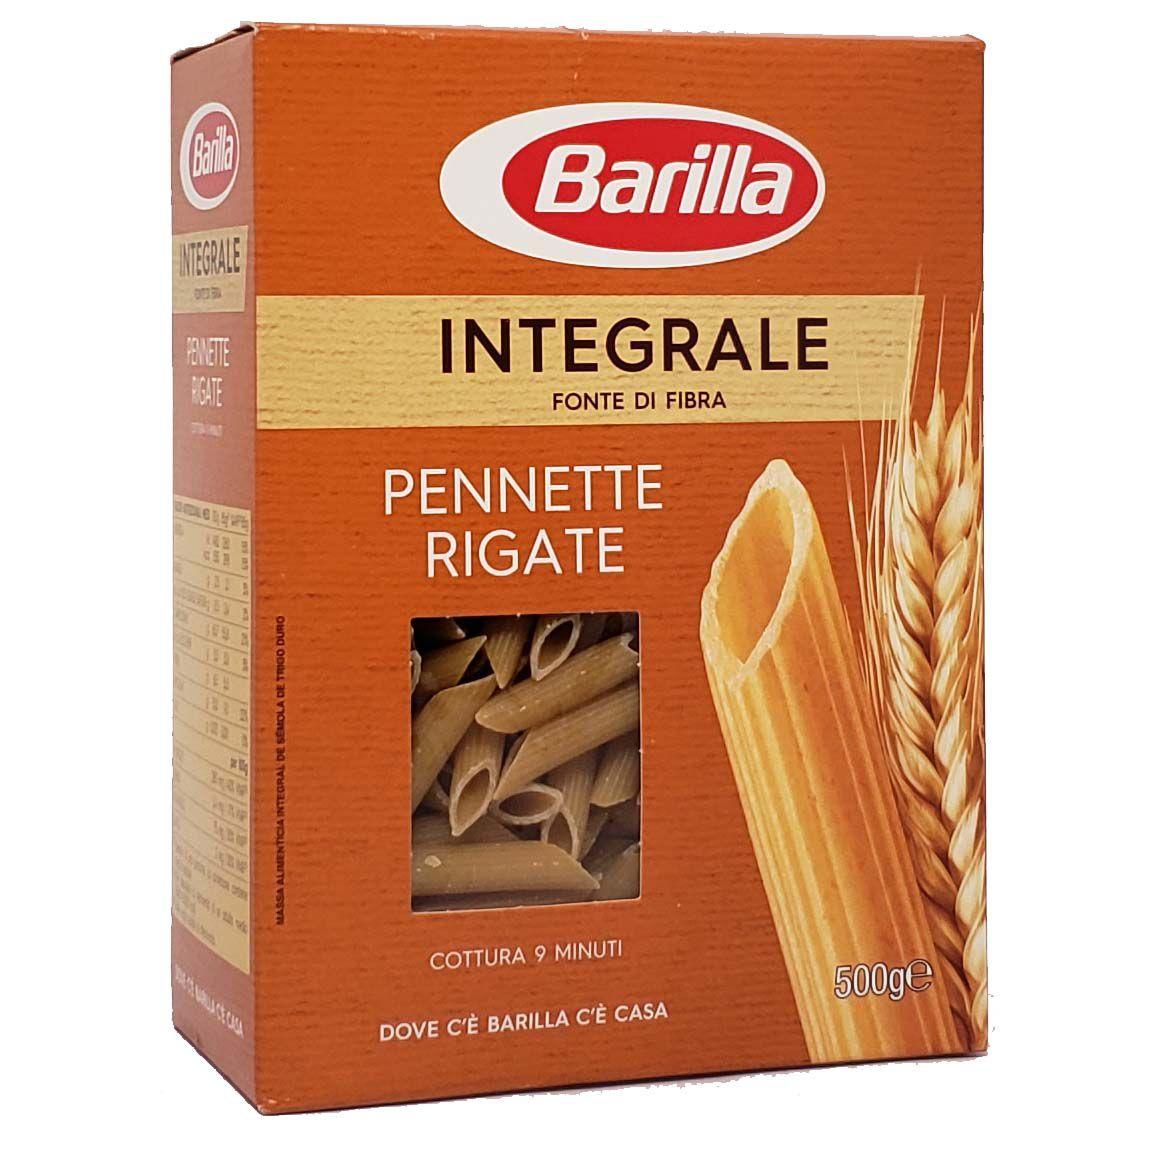 Macarrão Pennette Rigate Integrale Barilla - 500g -